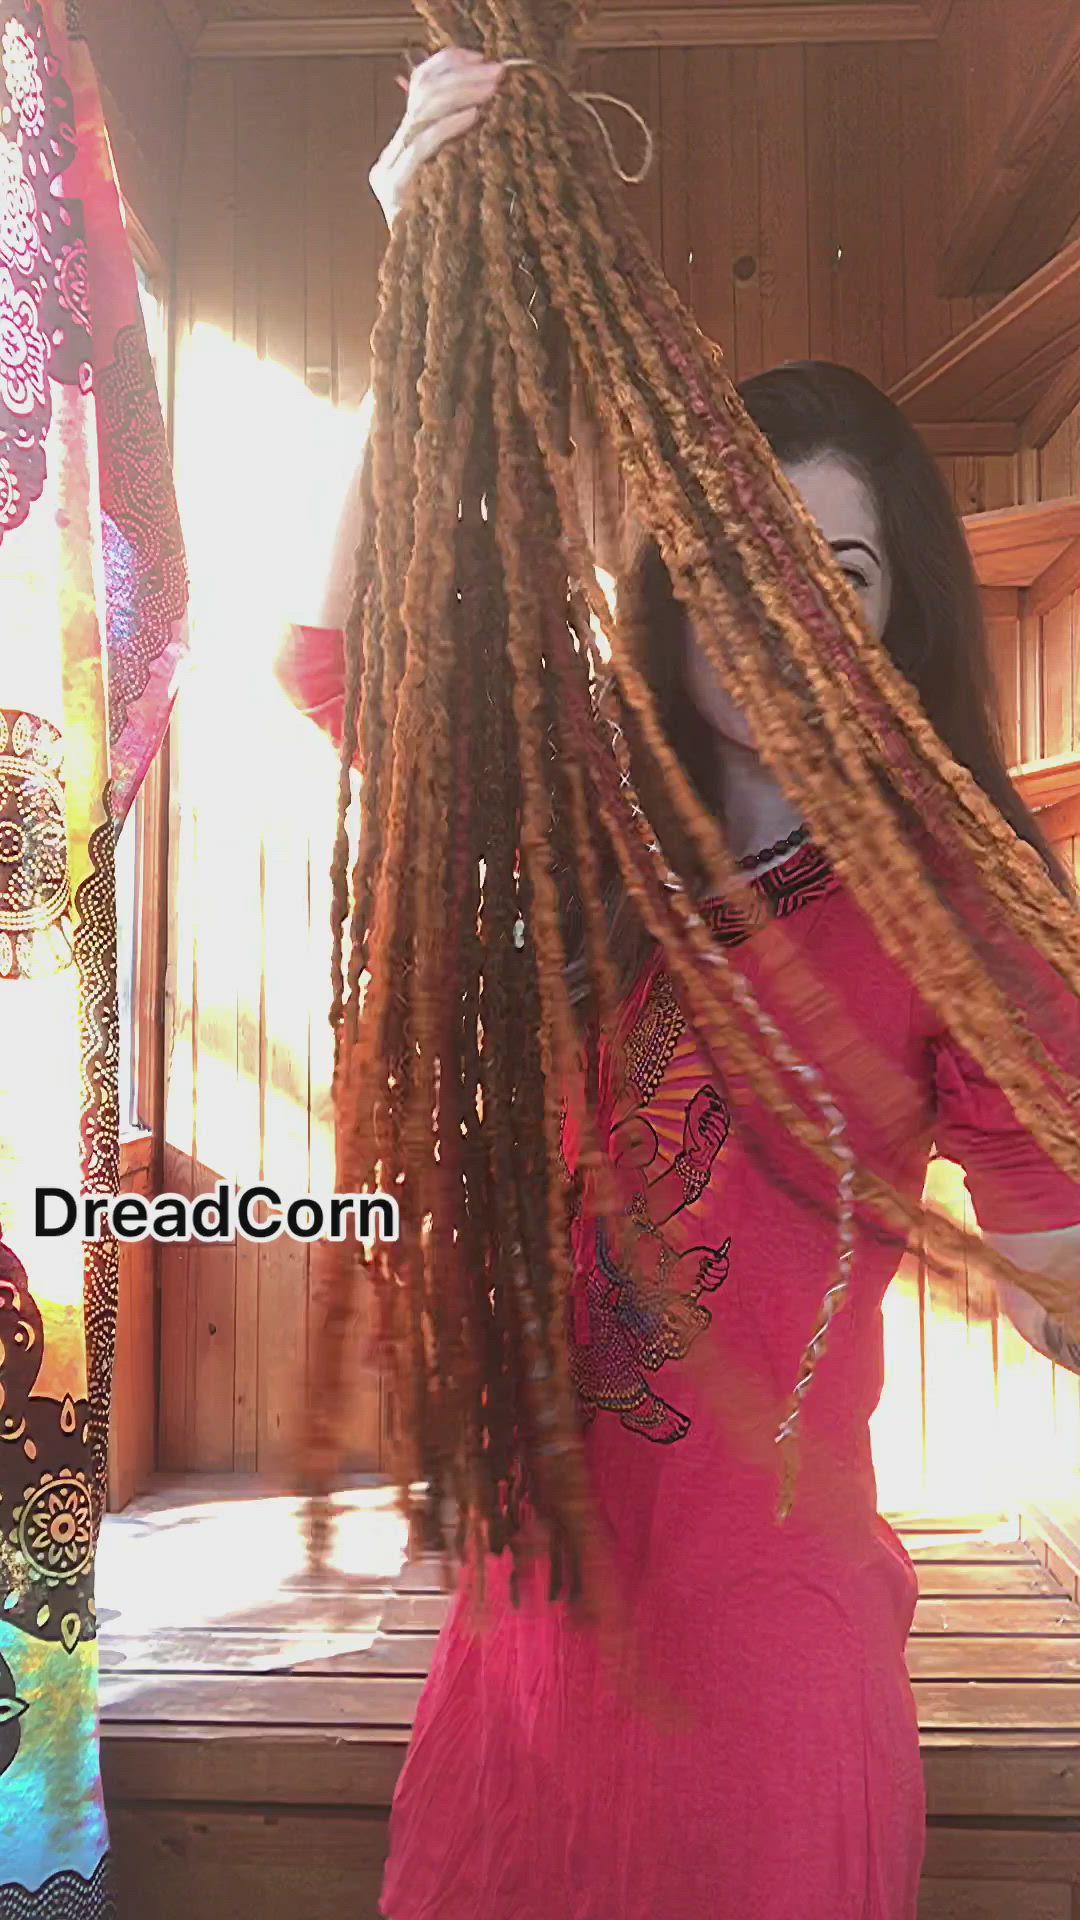 Ginger Synthetic Crochet Dreads Double Ended Or Single Ended Etsy Video Video In 2020 Crochet Dreads Fake Dreadlocks Kanekalon Synthetic Hair